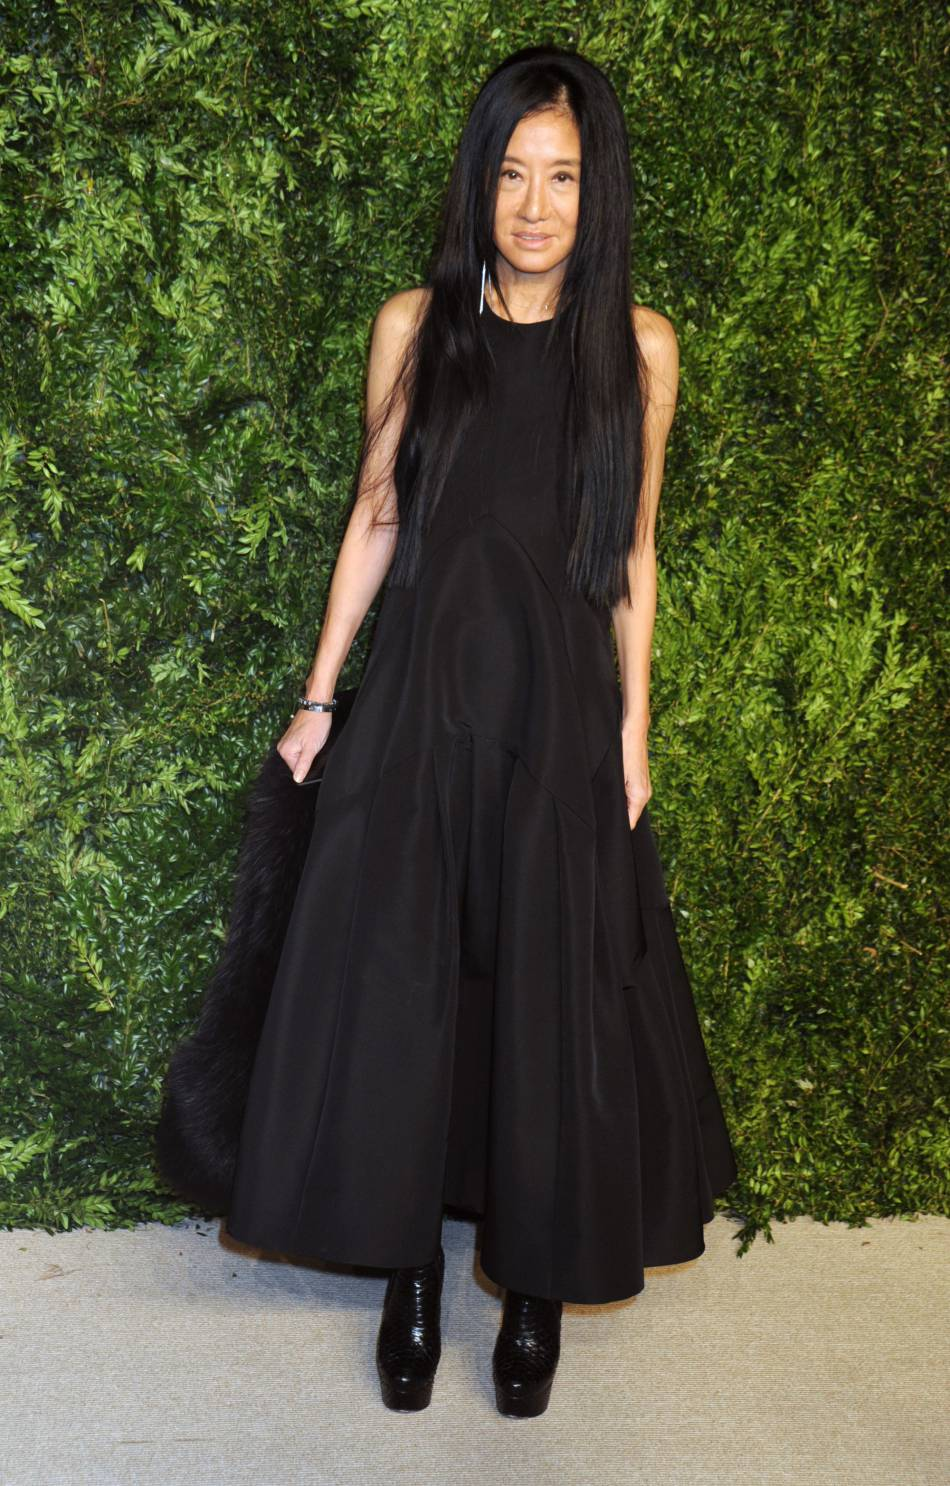 Vera Wang à la soirée CFDA/Vogue Fashion Fund Awards de ce lundi 2 novembre 2015.